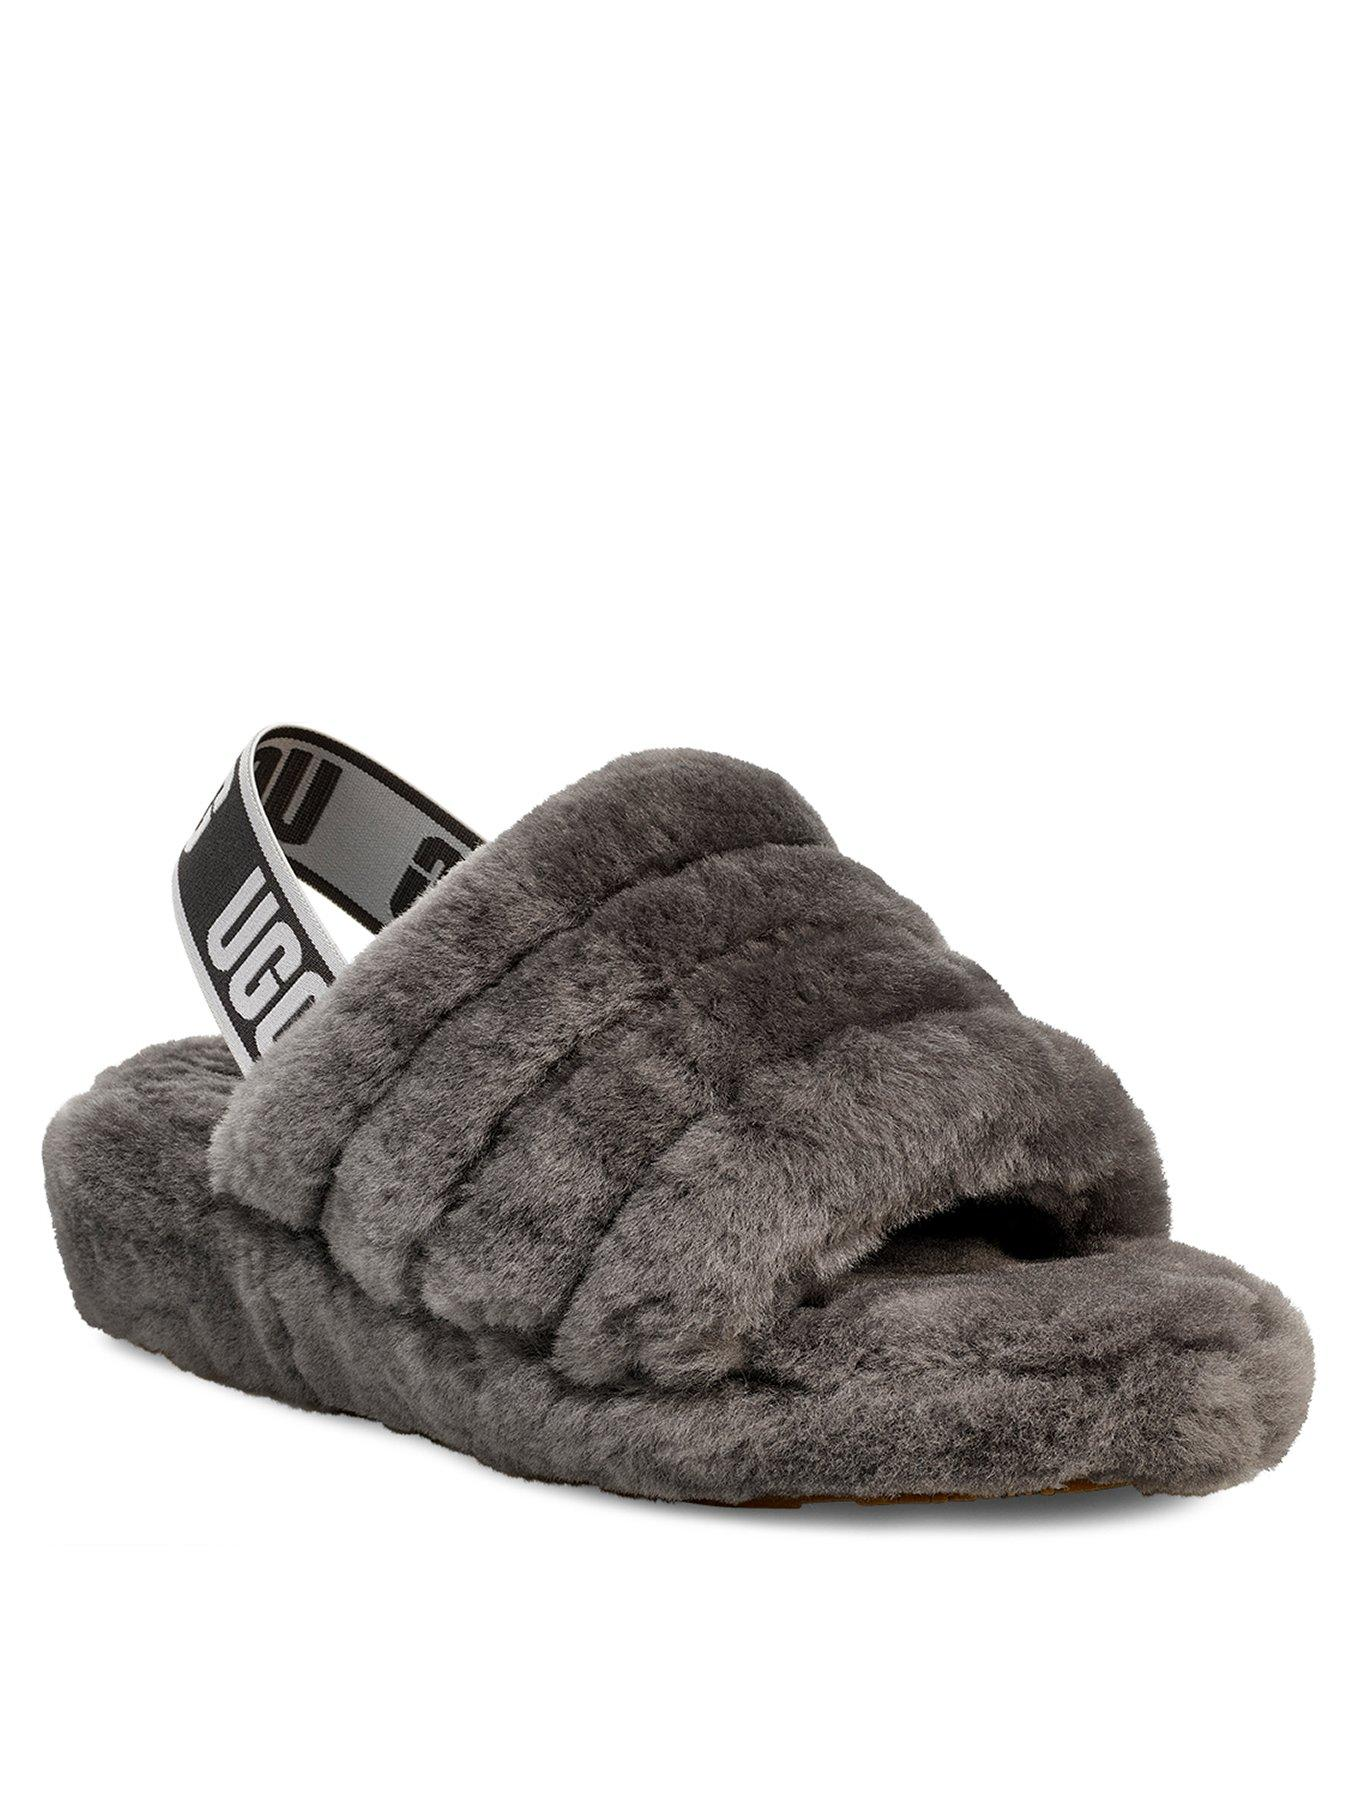 fluff ugg slippers